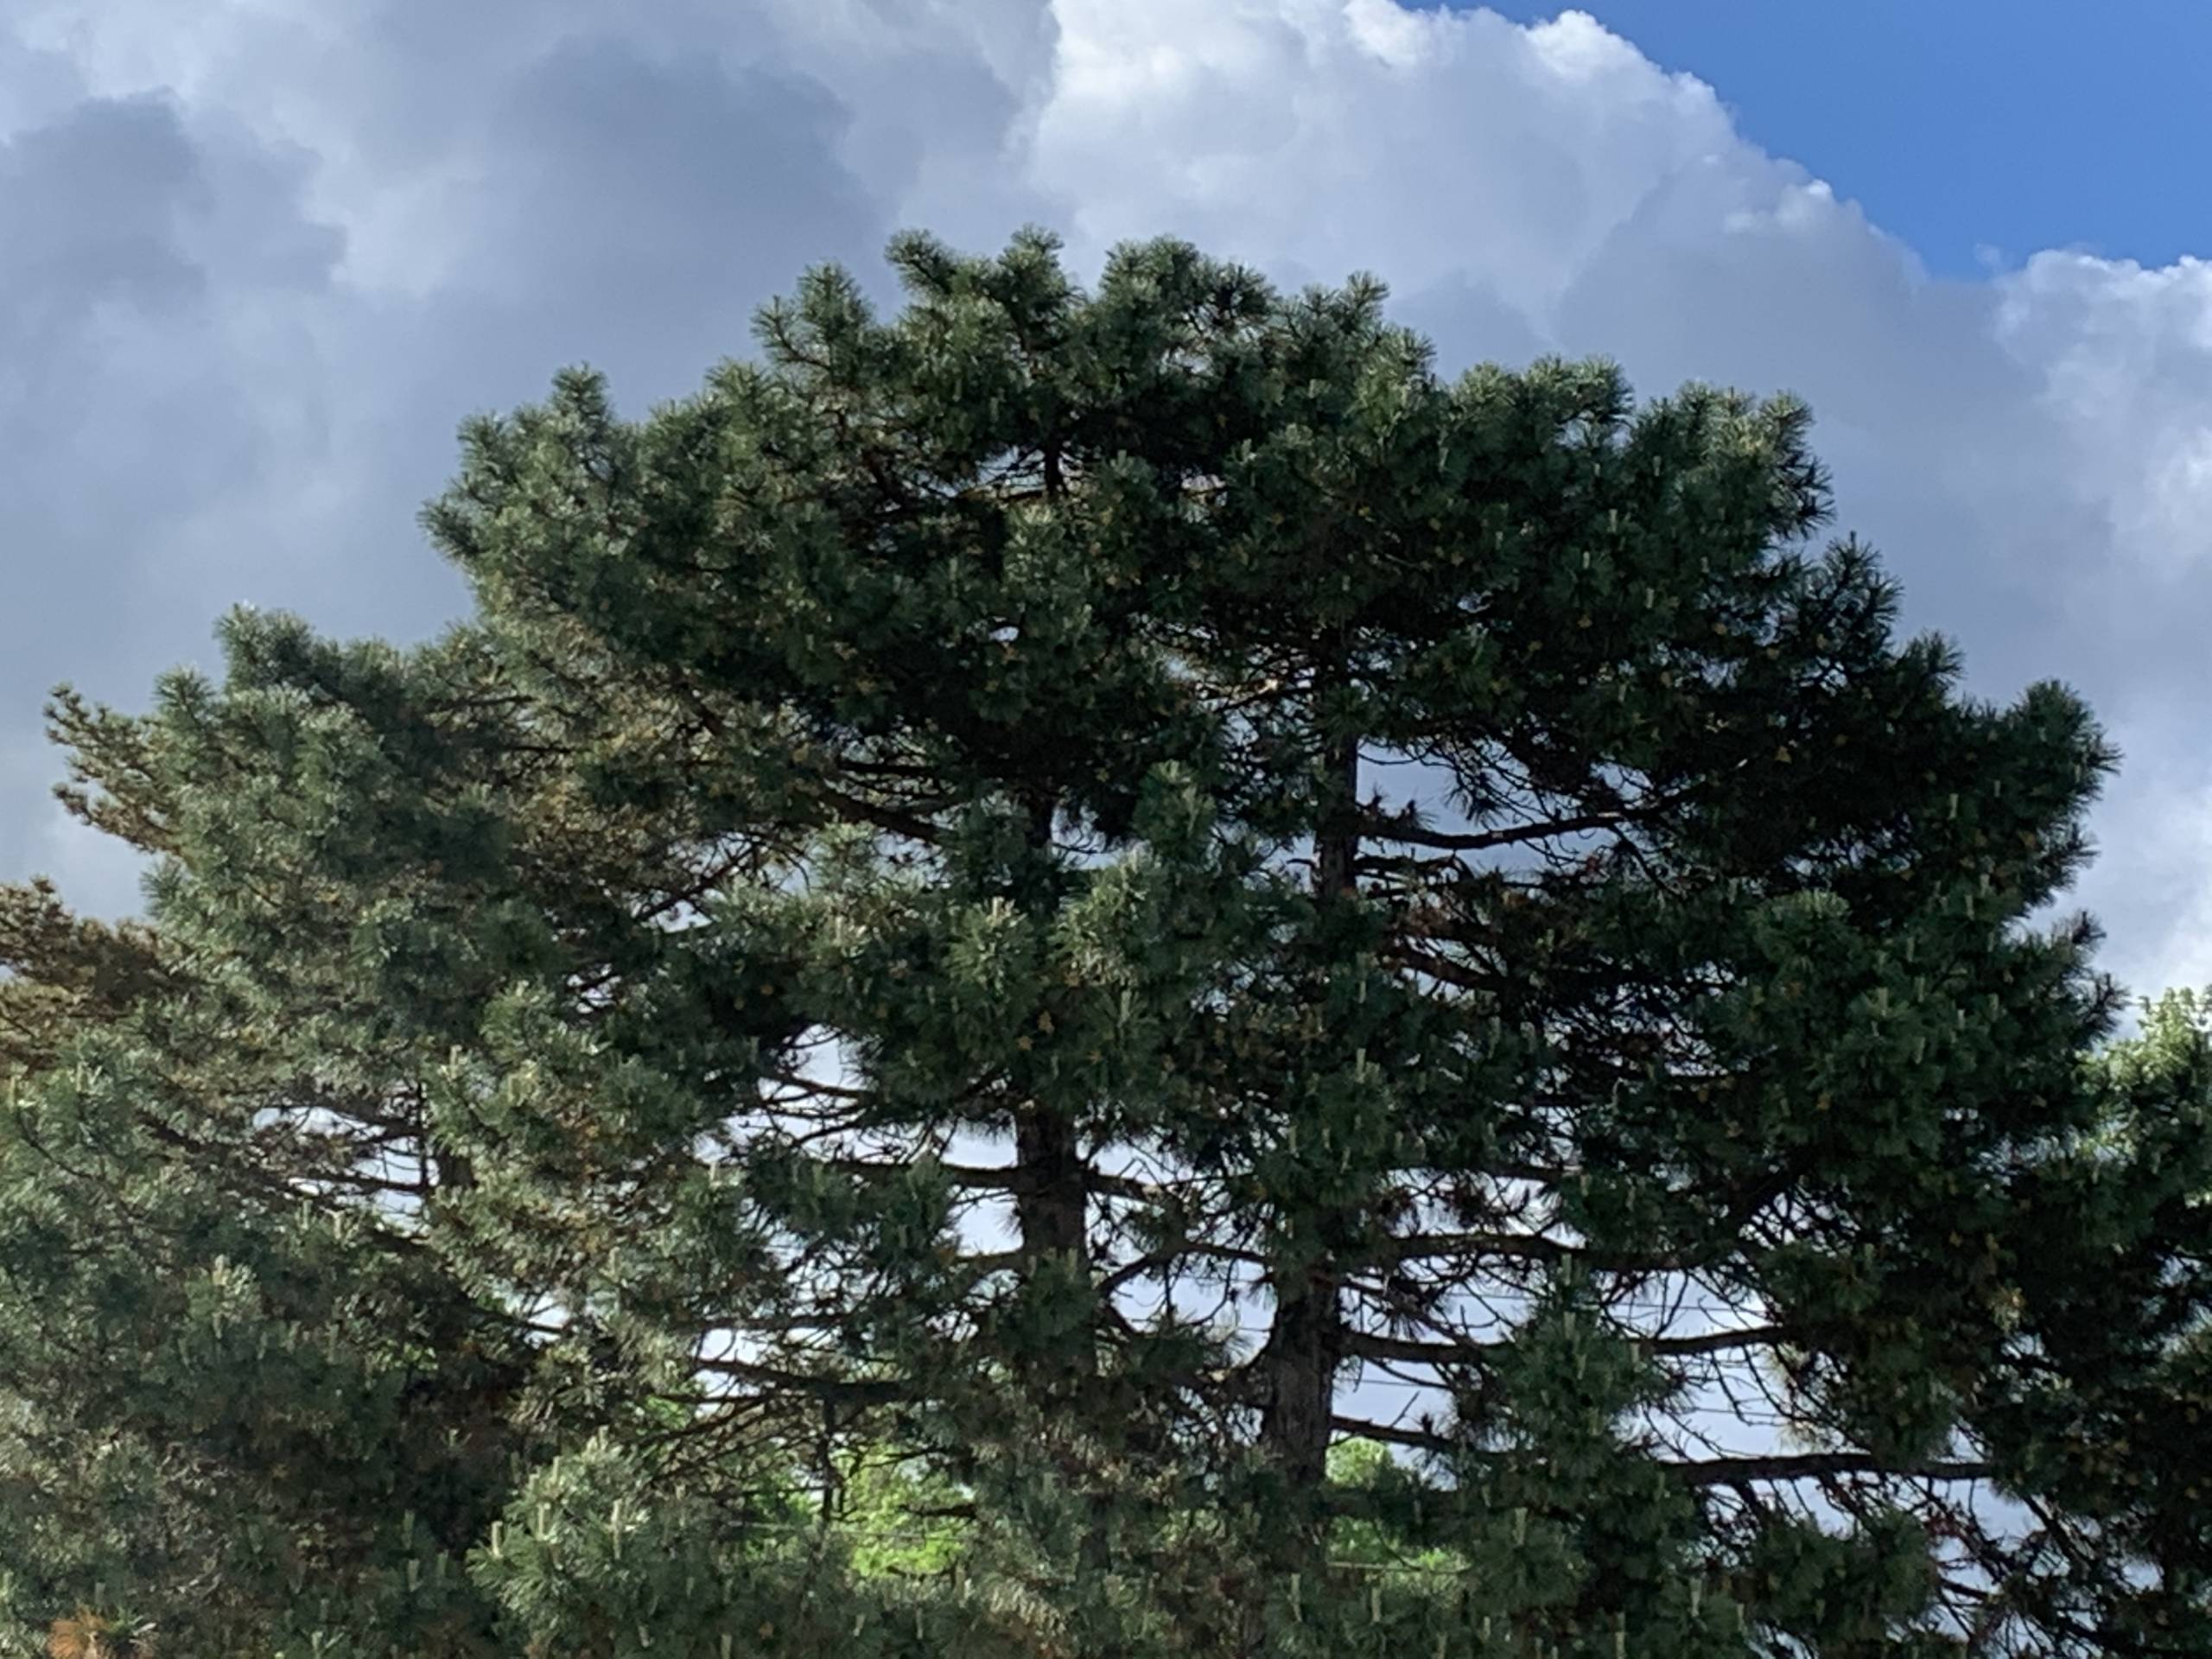 Scotch pine set off against partly cloudy sky